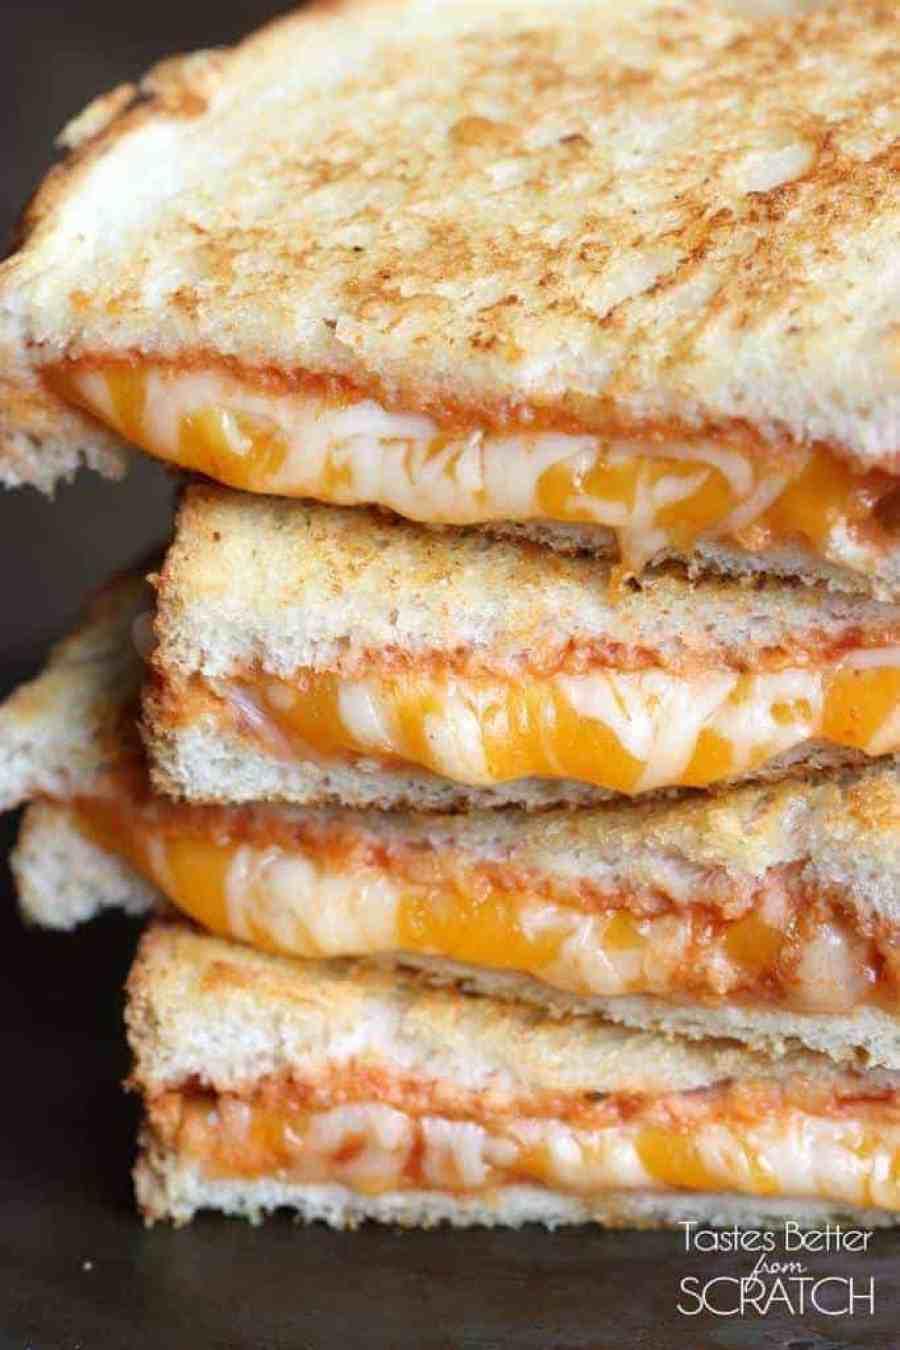 Italian Grilled Cheese recipe on TastesBetterFromScratch.com